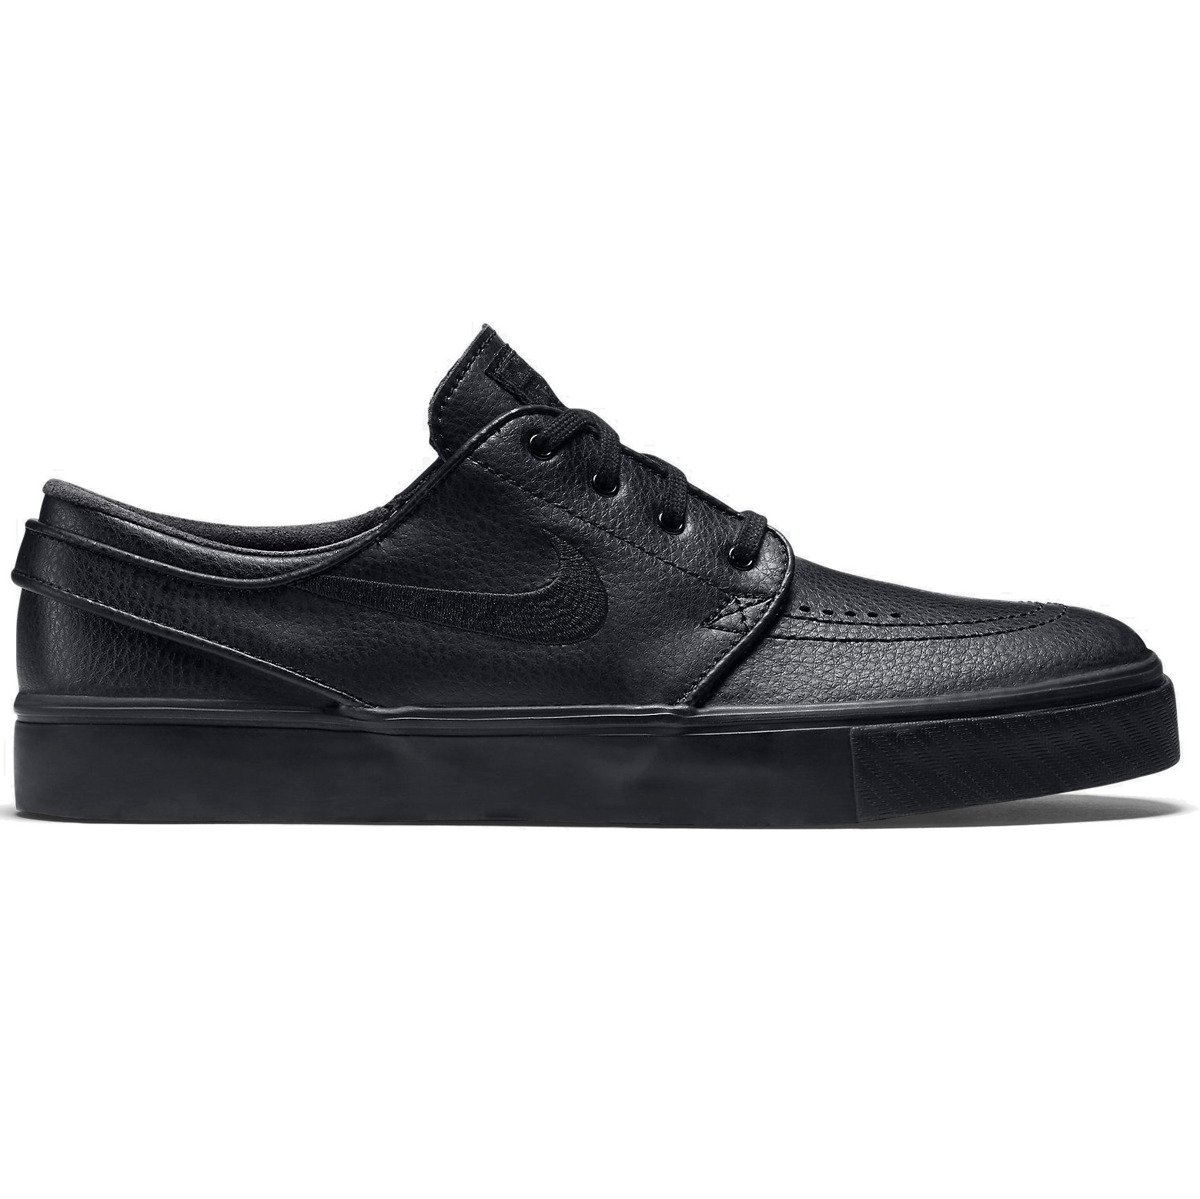 buty nike sb air zoom stefan janoski leather black/black-black-anthracite •  Miniramp Skateshop